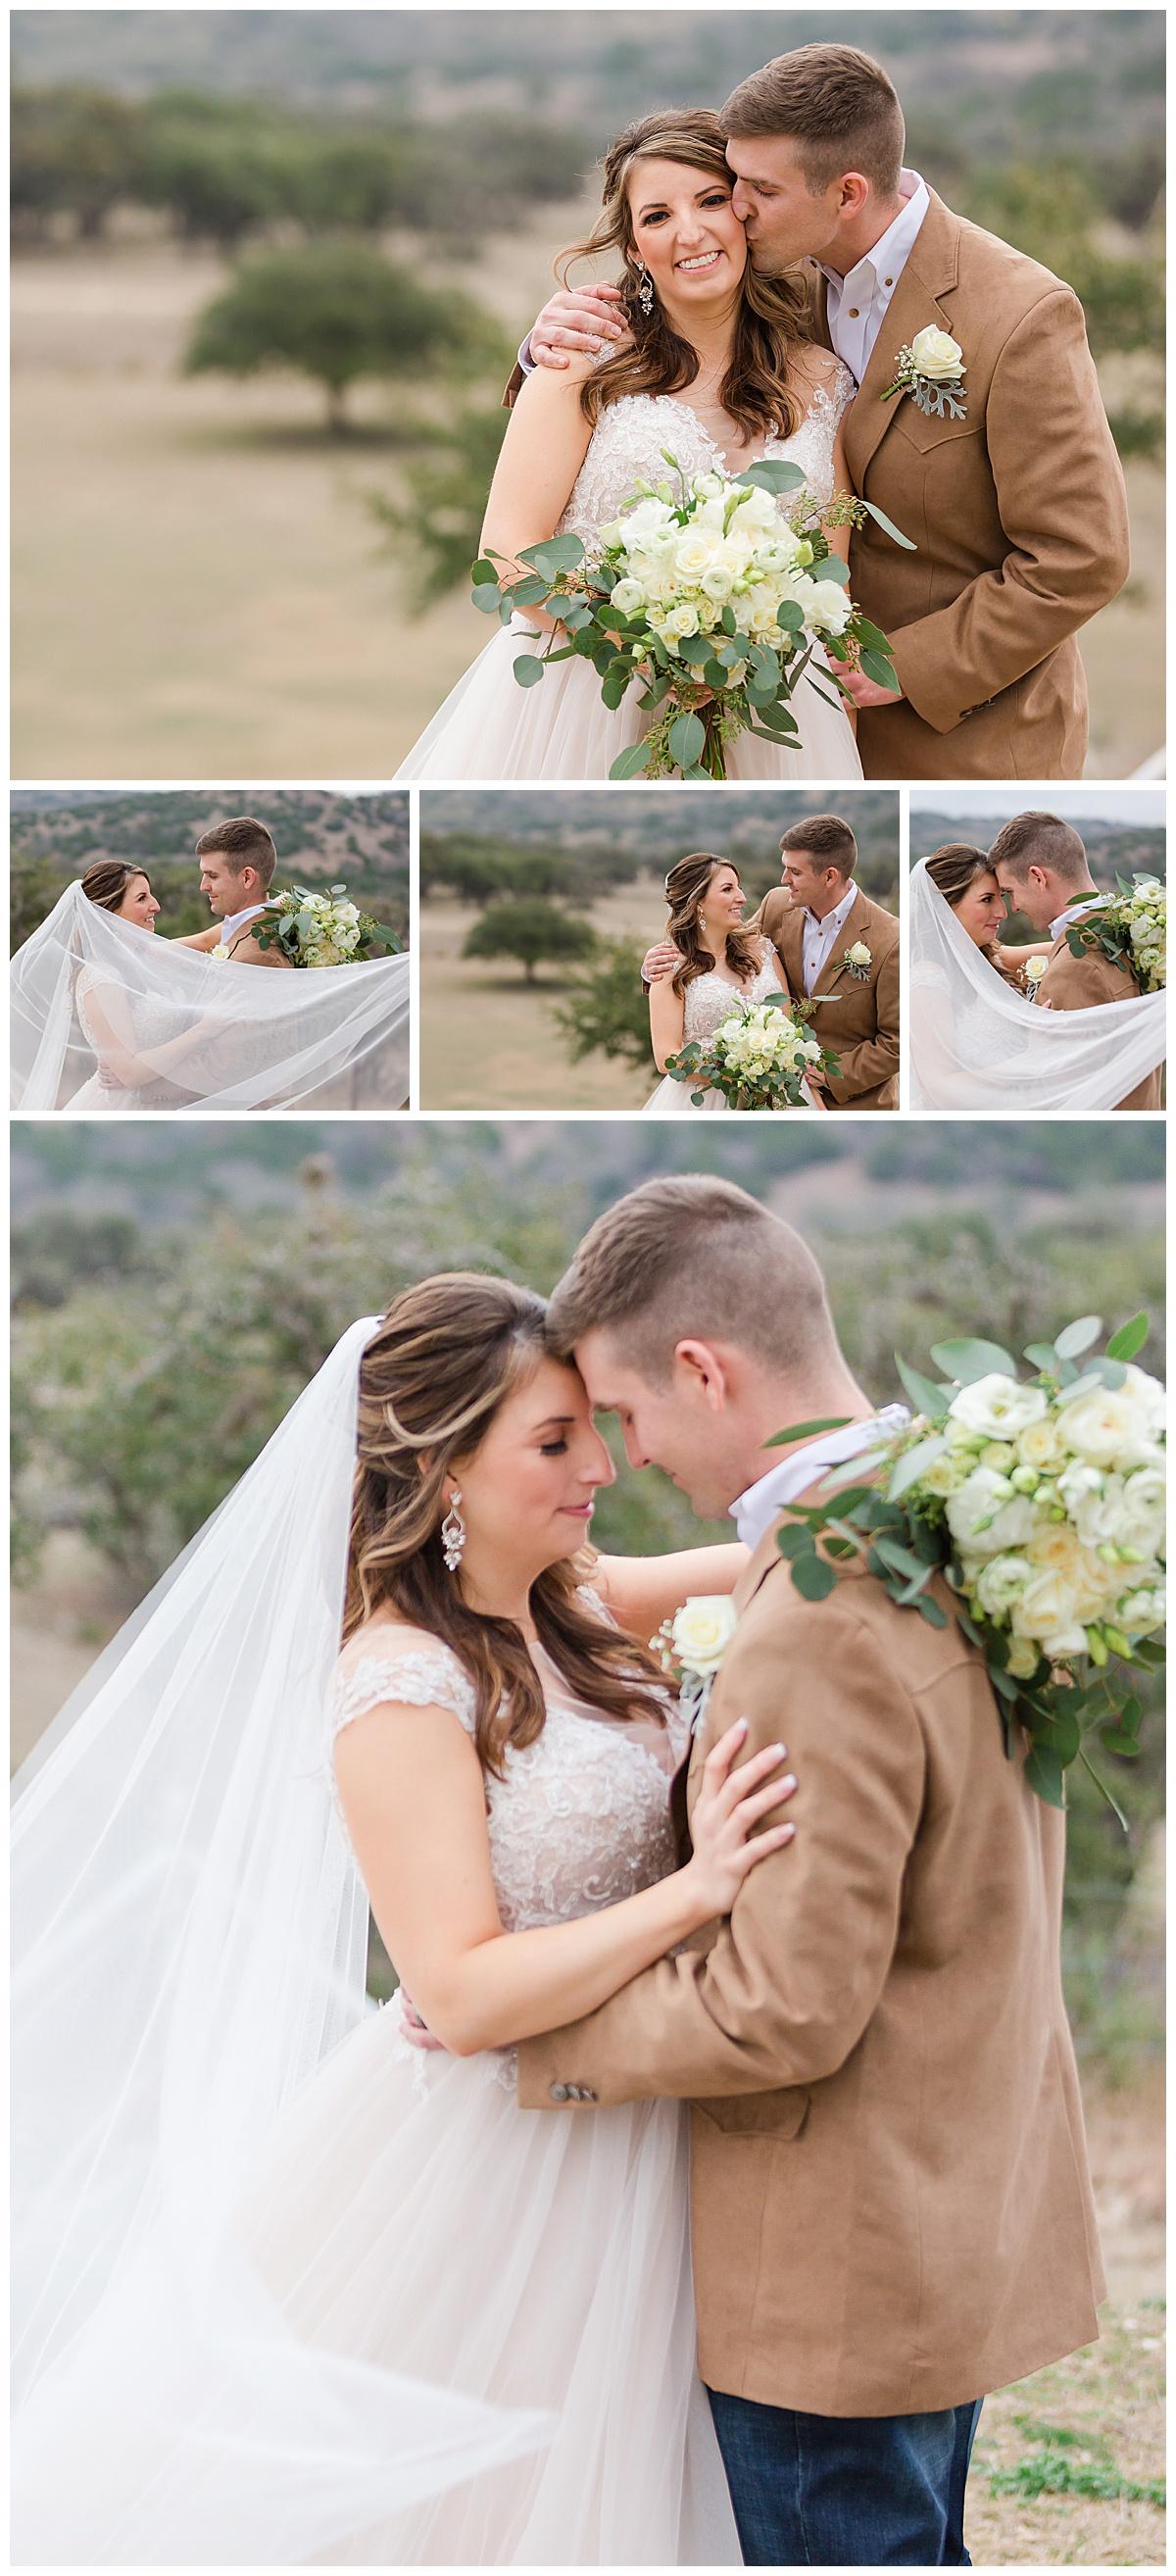 Wedding-Photographer-Texas-Hill-Country-Happy-H-Ranch-Comfor-Texas-Carly-Barton-Photography_0044.jpg